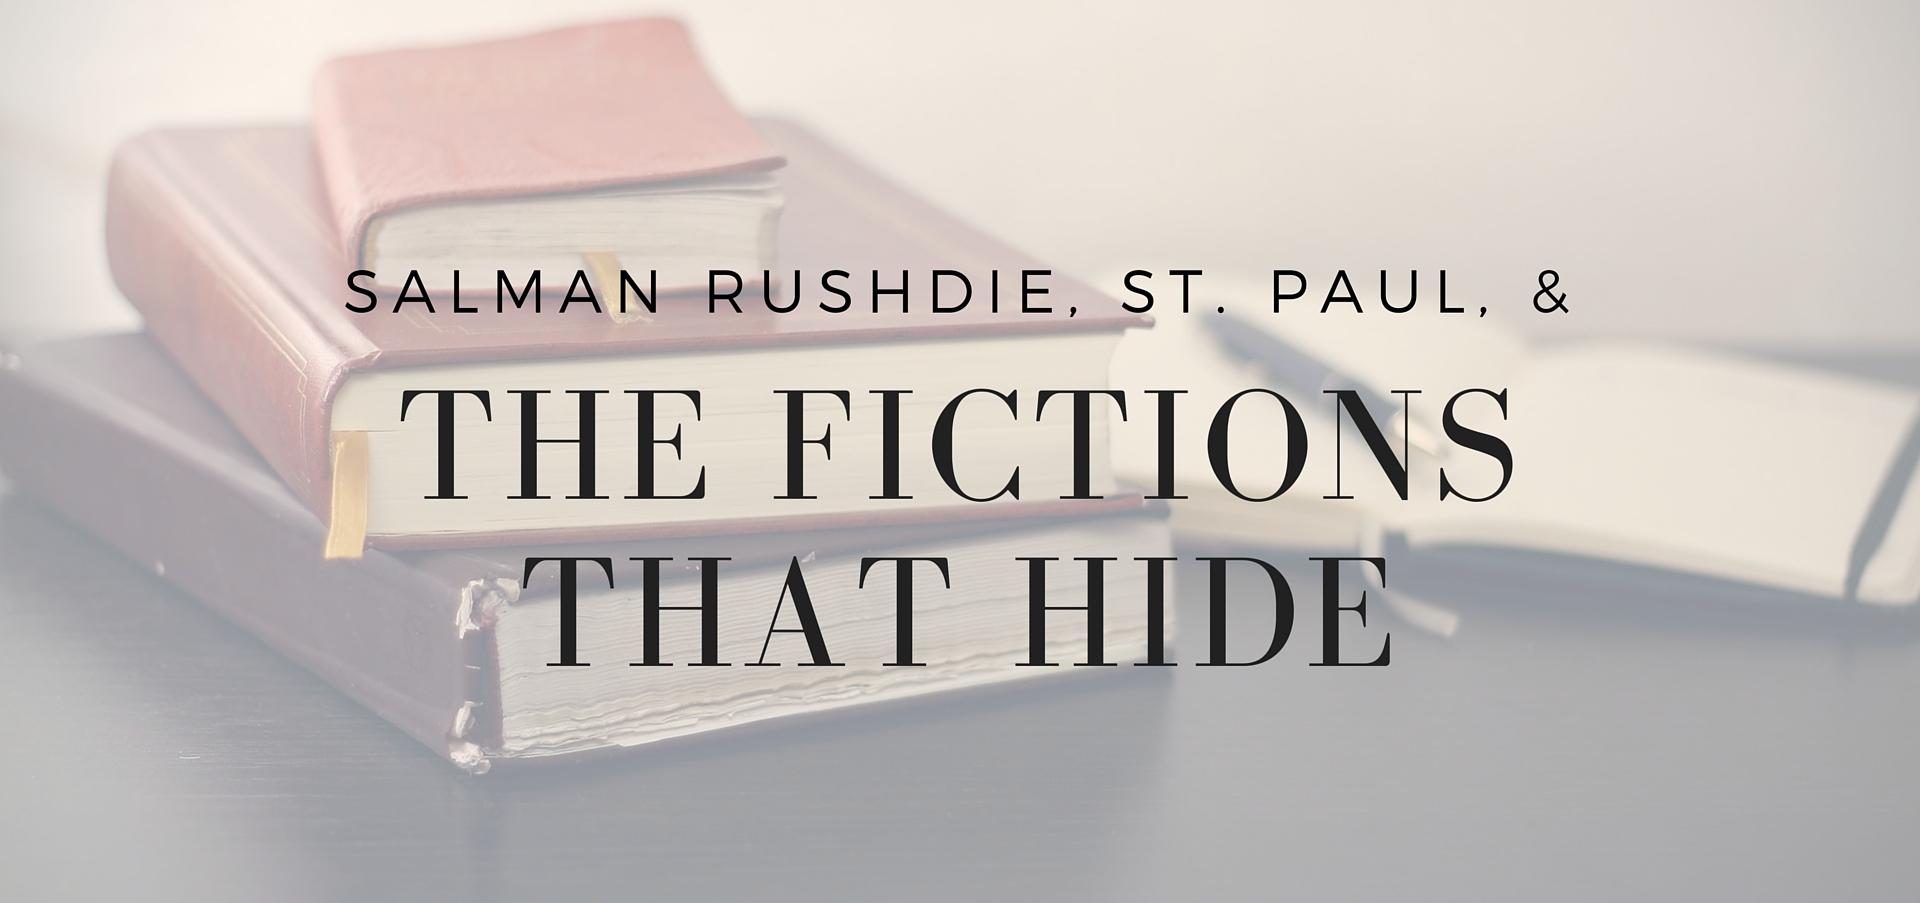 Salman Rushdie, St Paul, and the Fictions that Hide - Is scripture fiction? - read more on KateRaeDavis.com